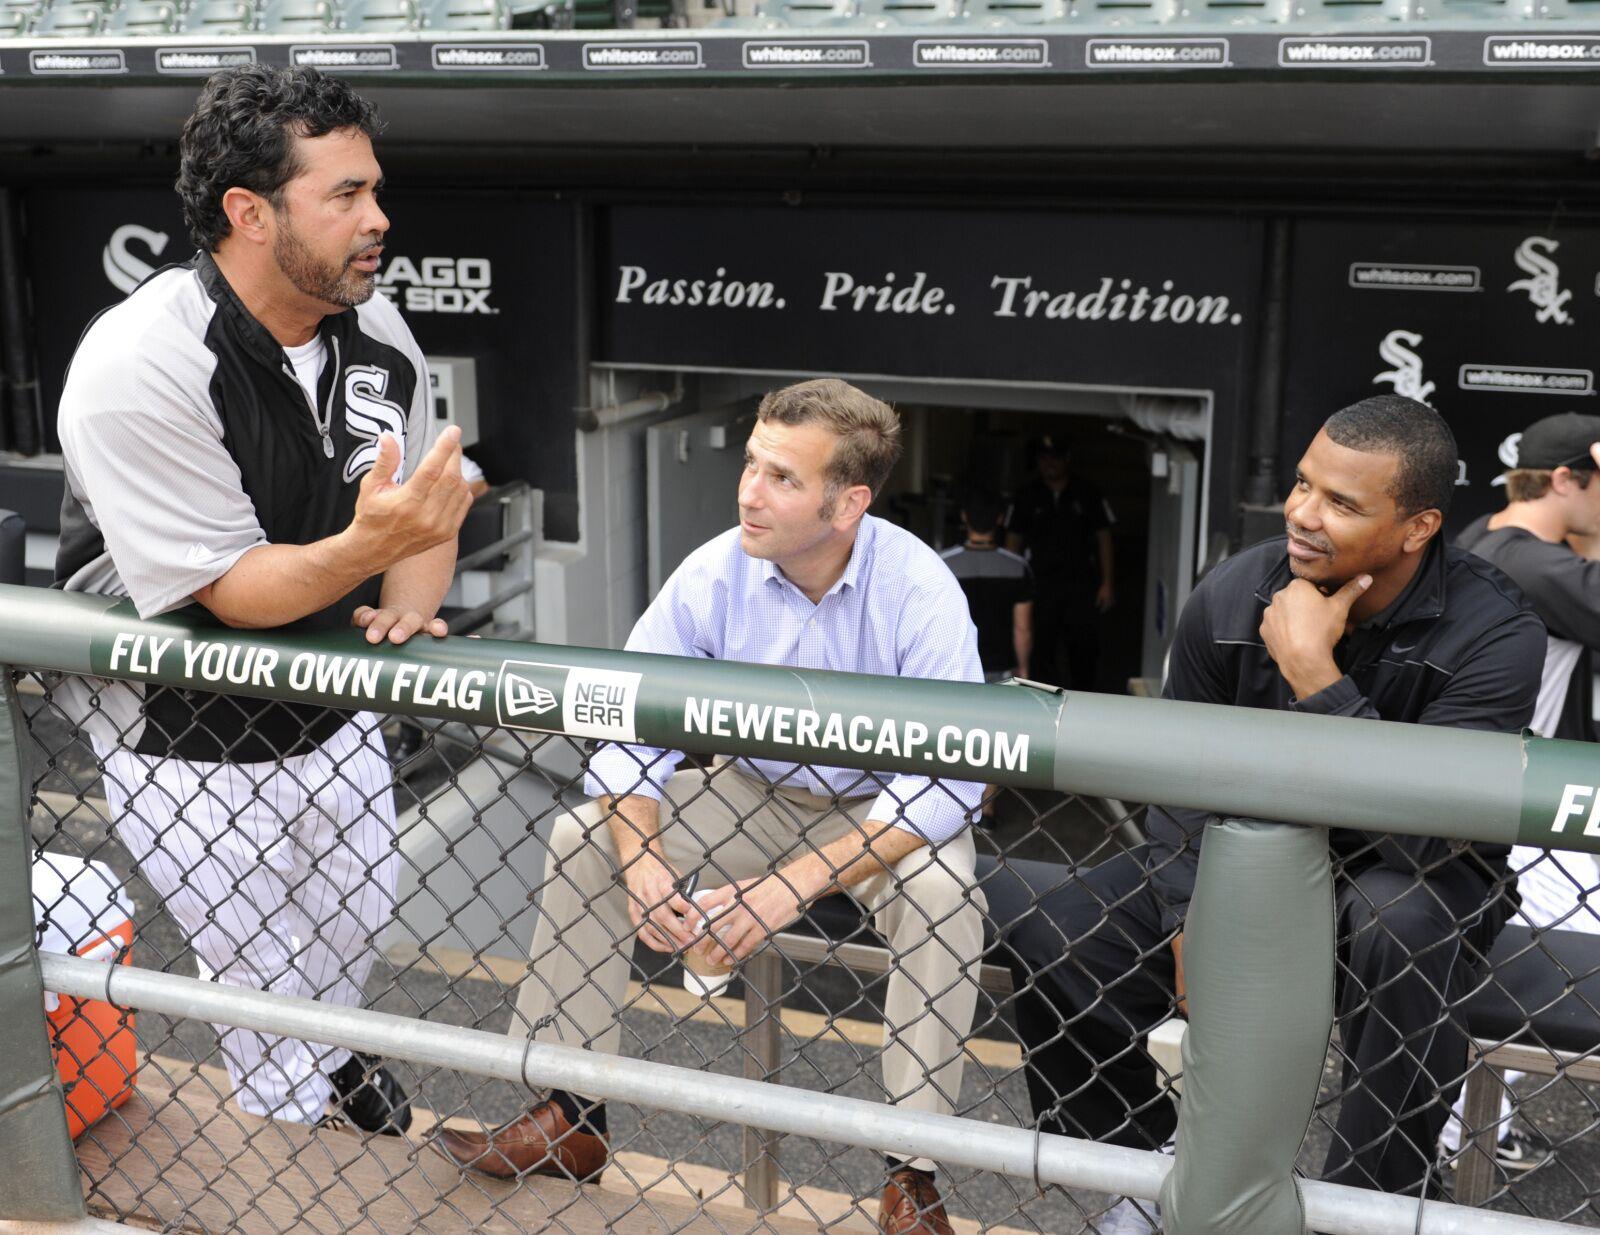 Chicago White Sox: Understanding who's running my team